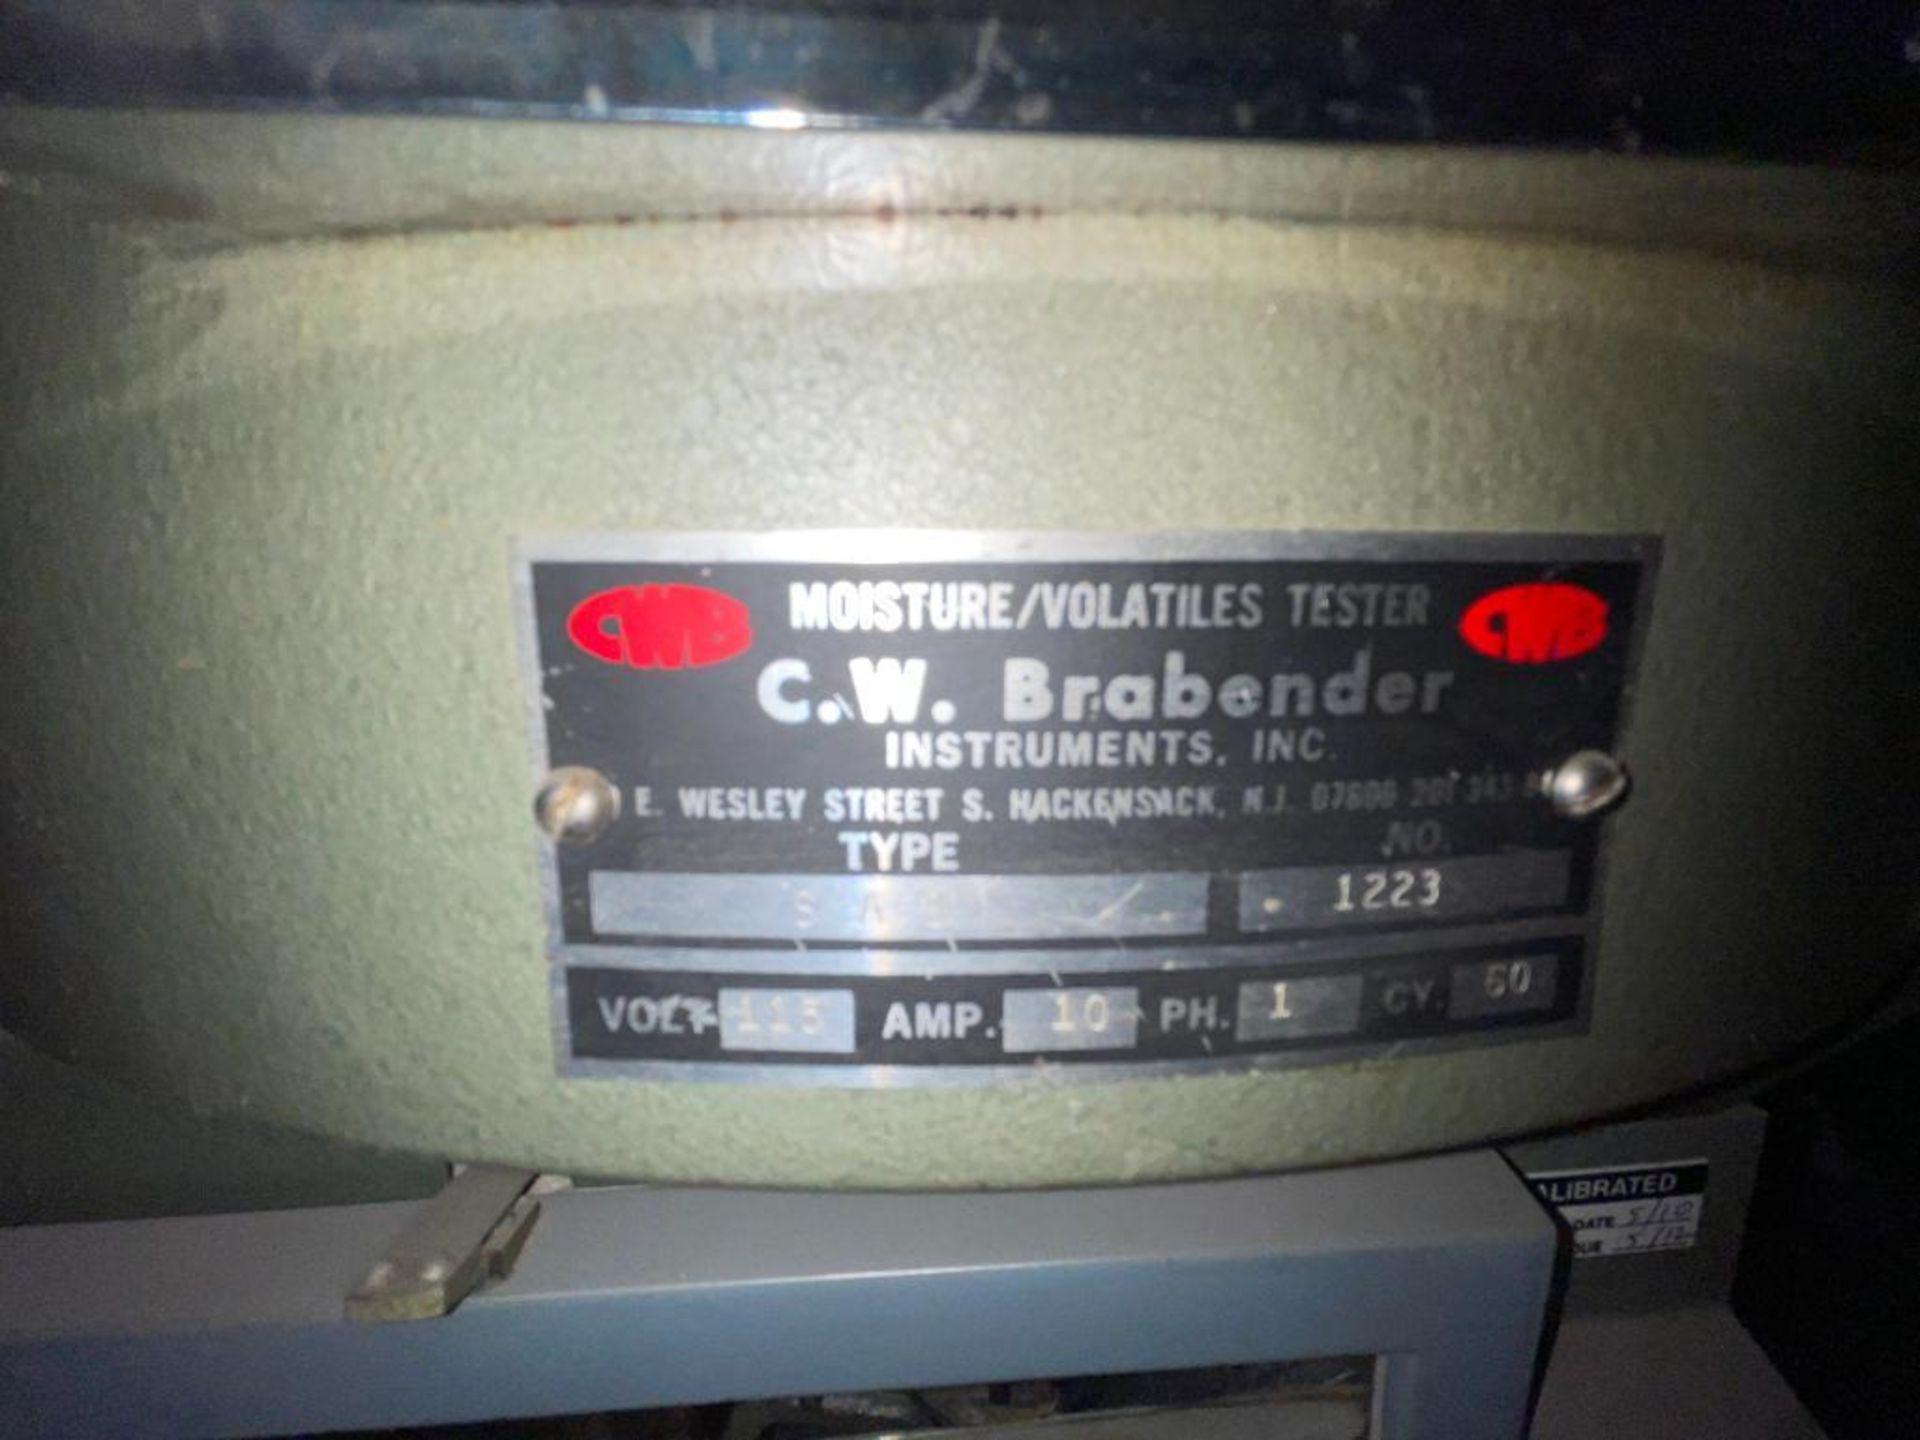 C.W. Brabender moisture tester - Image 2 of 9